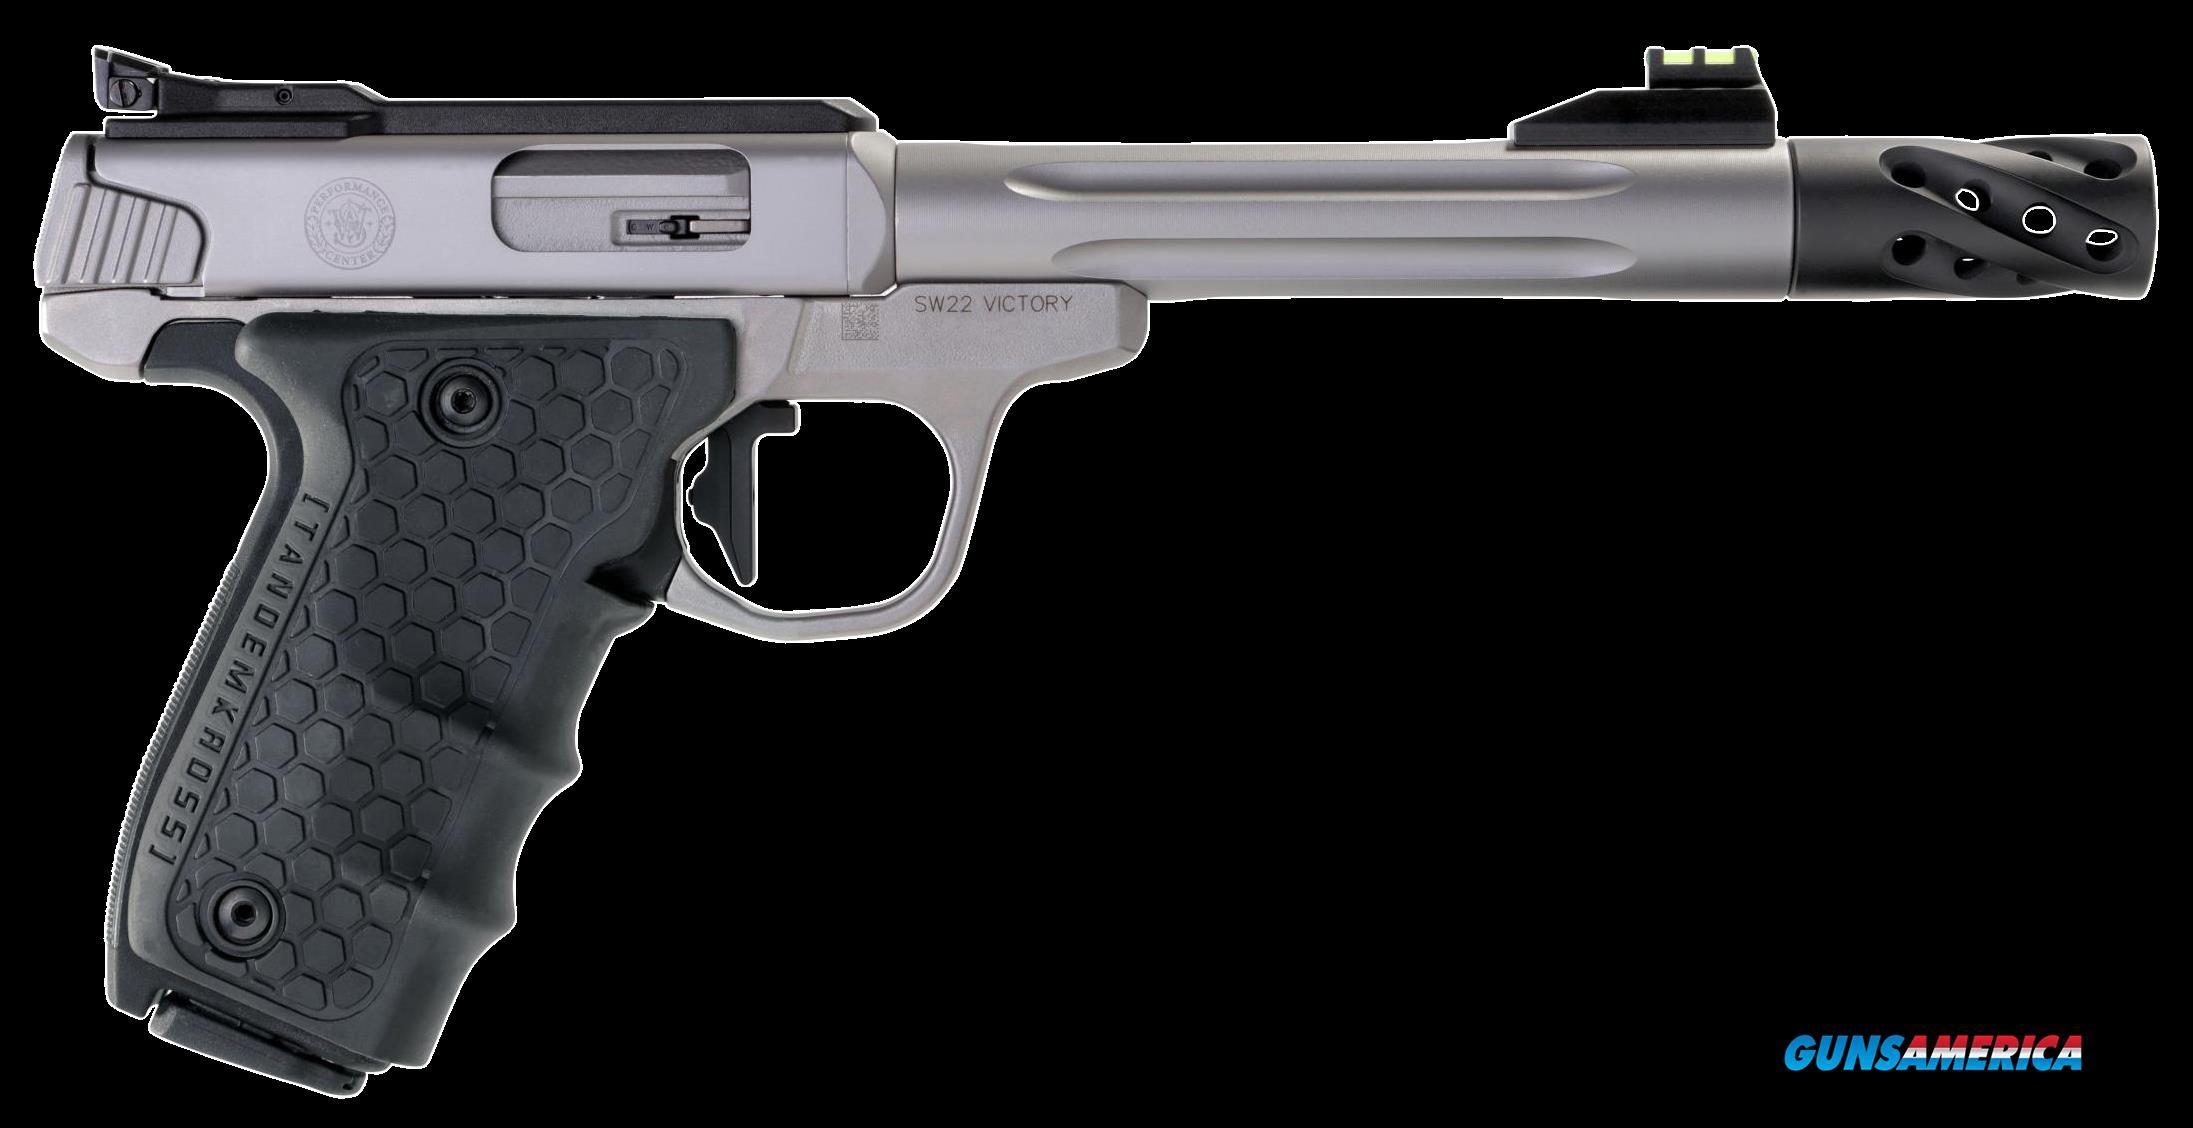 Smith & Wesson Performance Center, S&w Victory    12078  Pfmc 22lr 6in Trt Mb     Ss  Guns > Pistols > 1911 Pistol Copies (non-Colt)